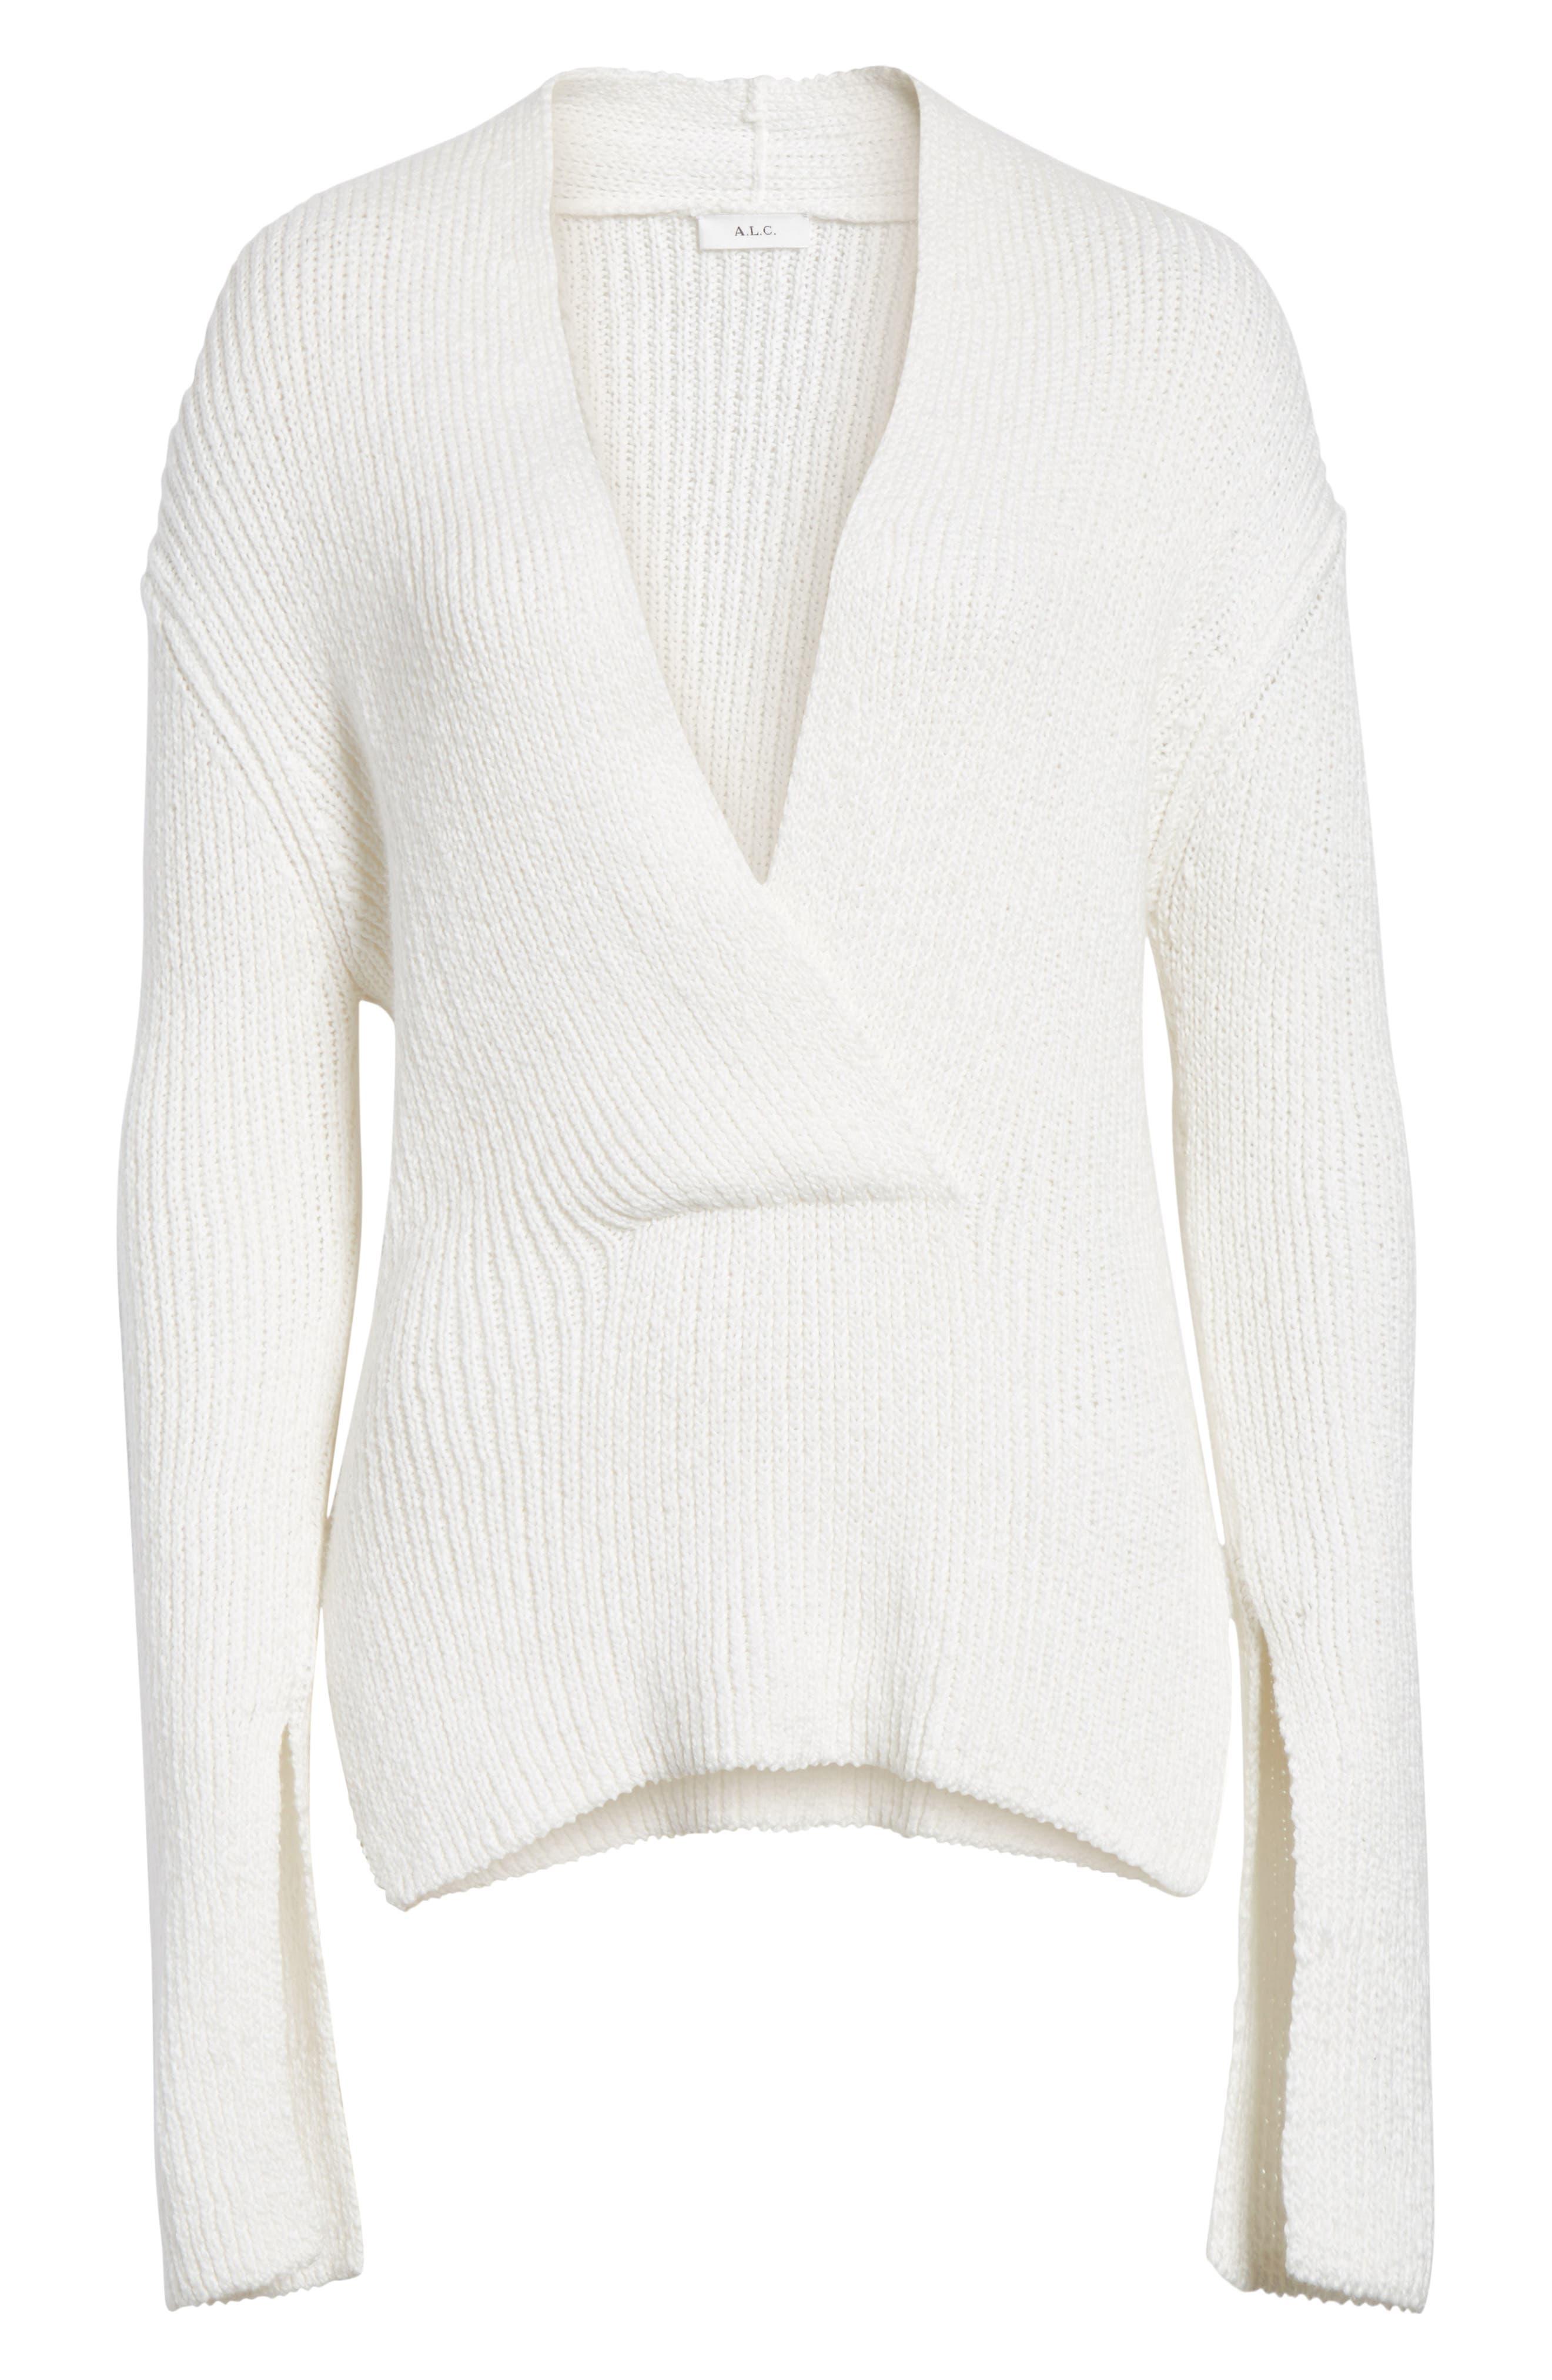 Nick Cotton Sweater,                             Alternate thumbnail 6, color,                             100